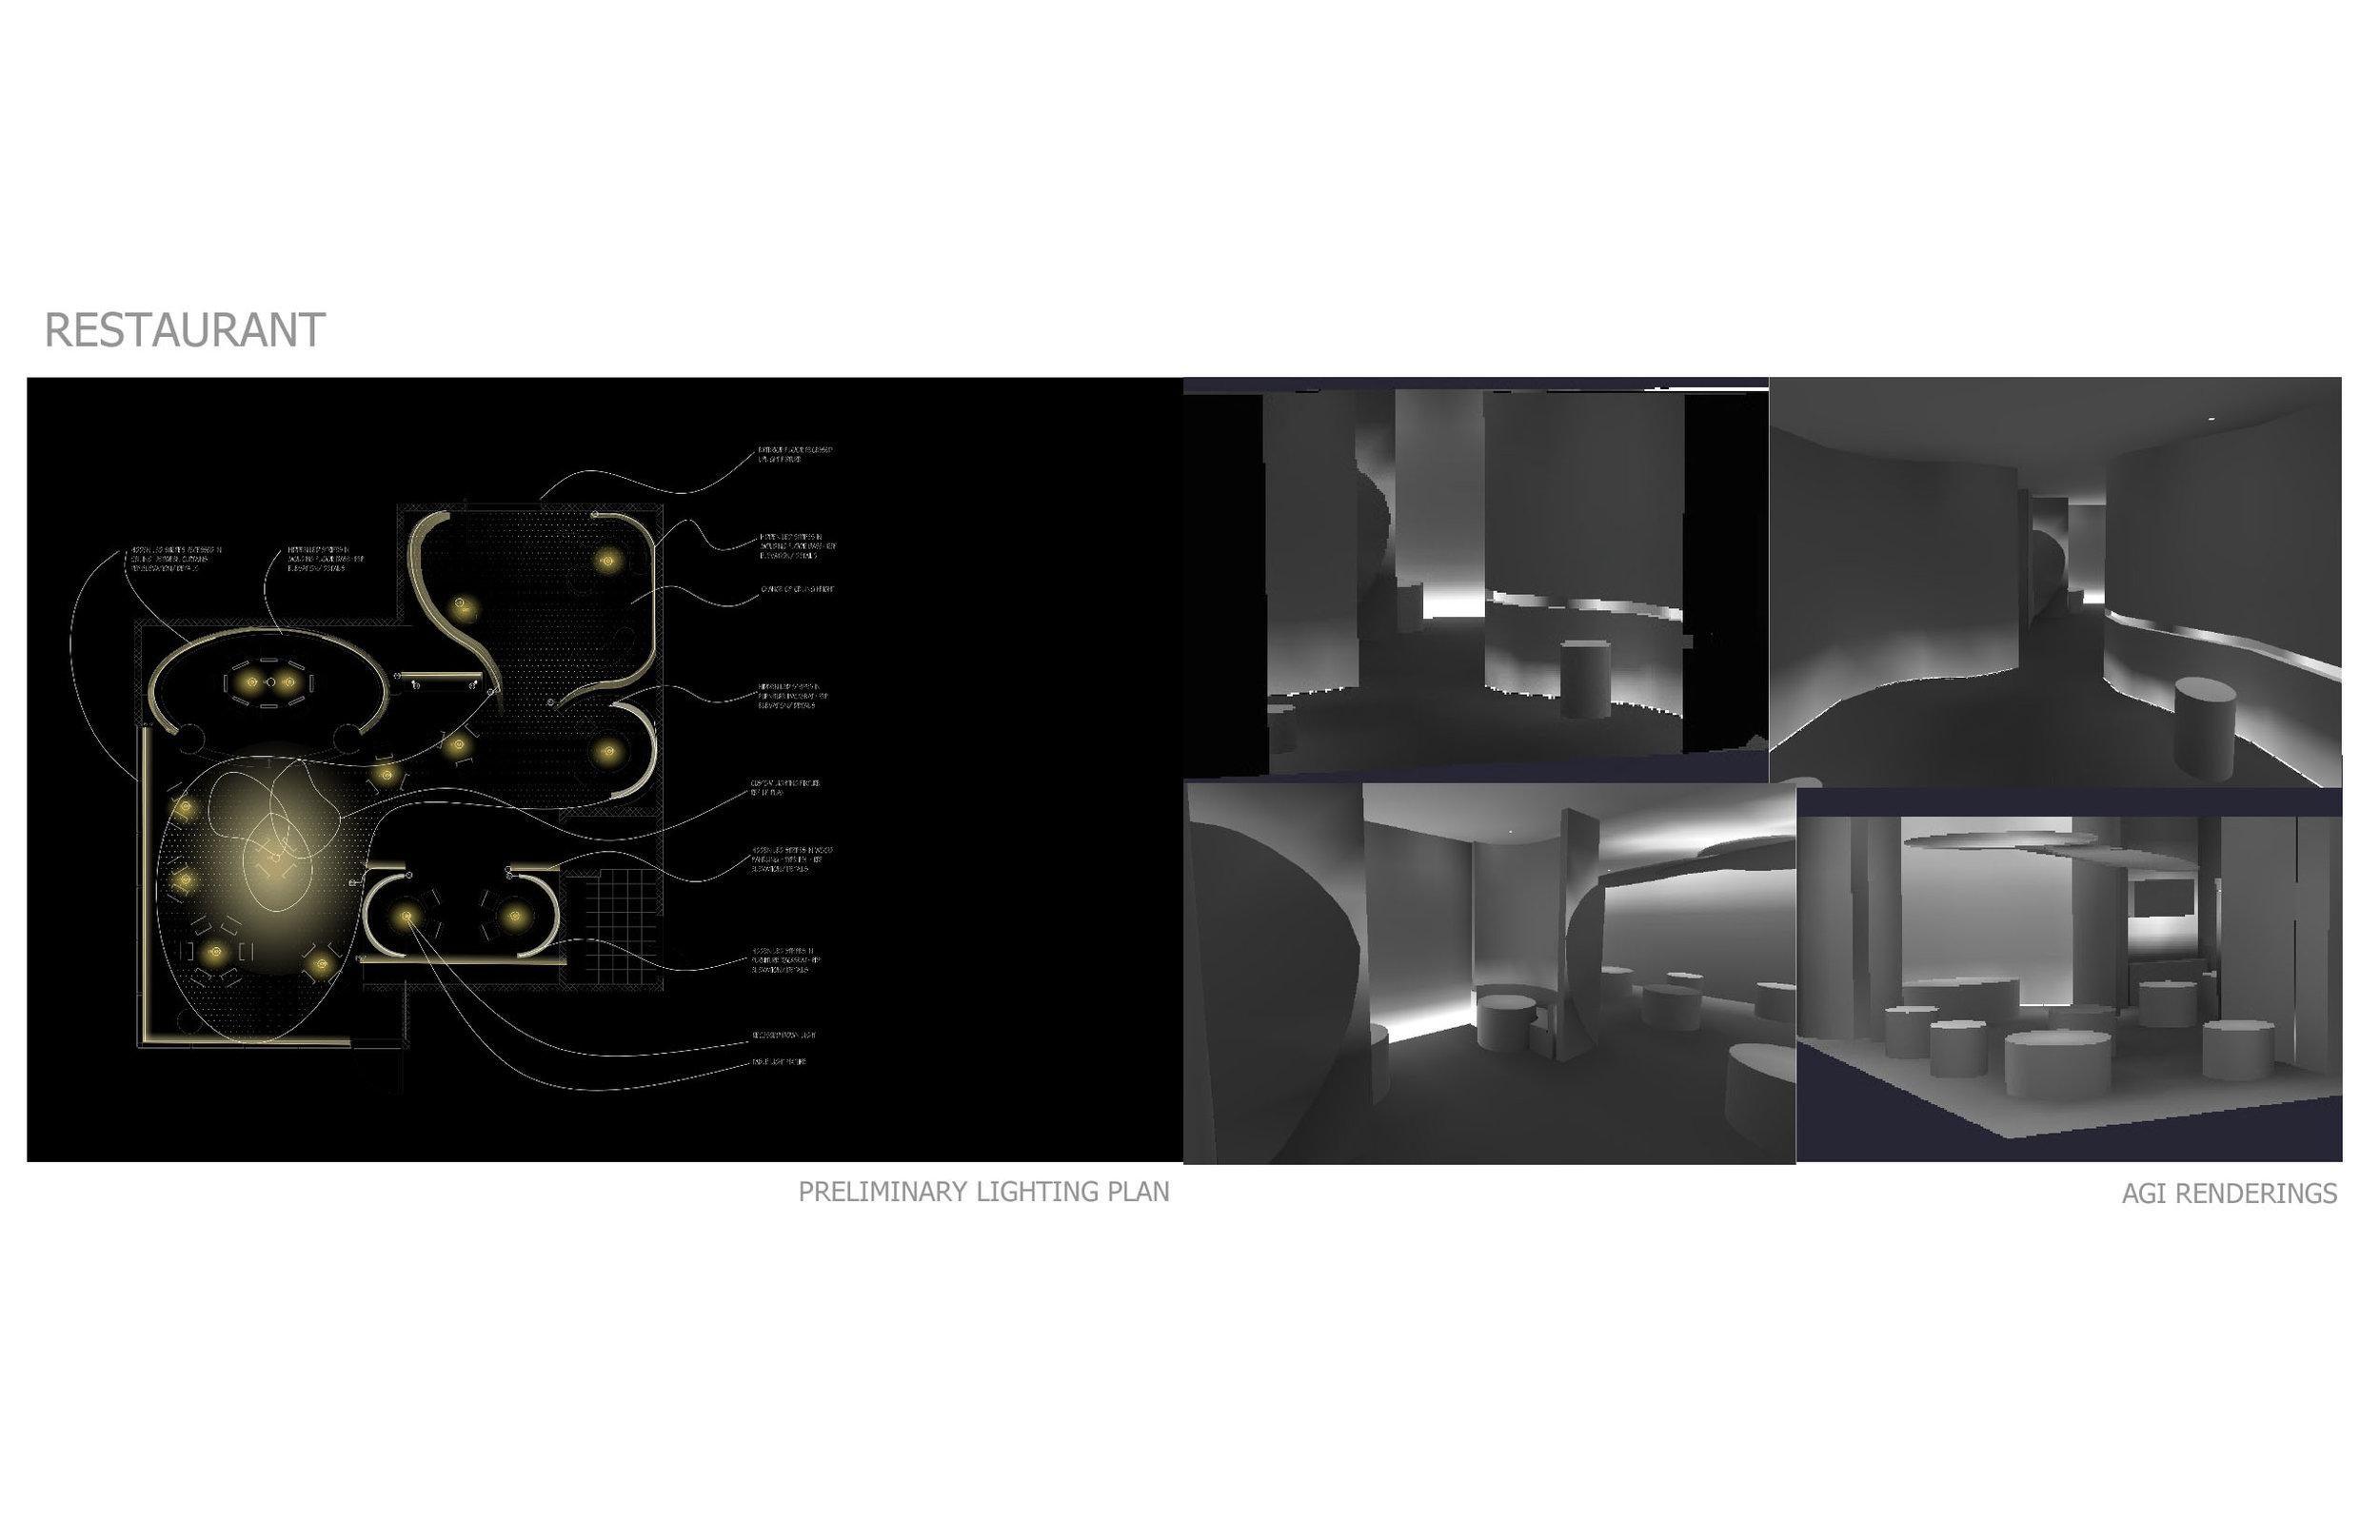 angelique-bidet-mps-interior-lighting-design-projects_17644189351_o.jpg